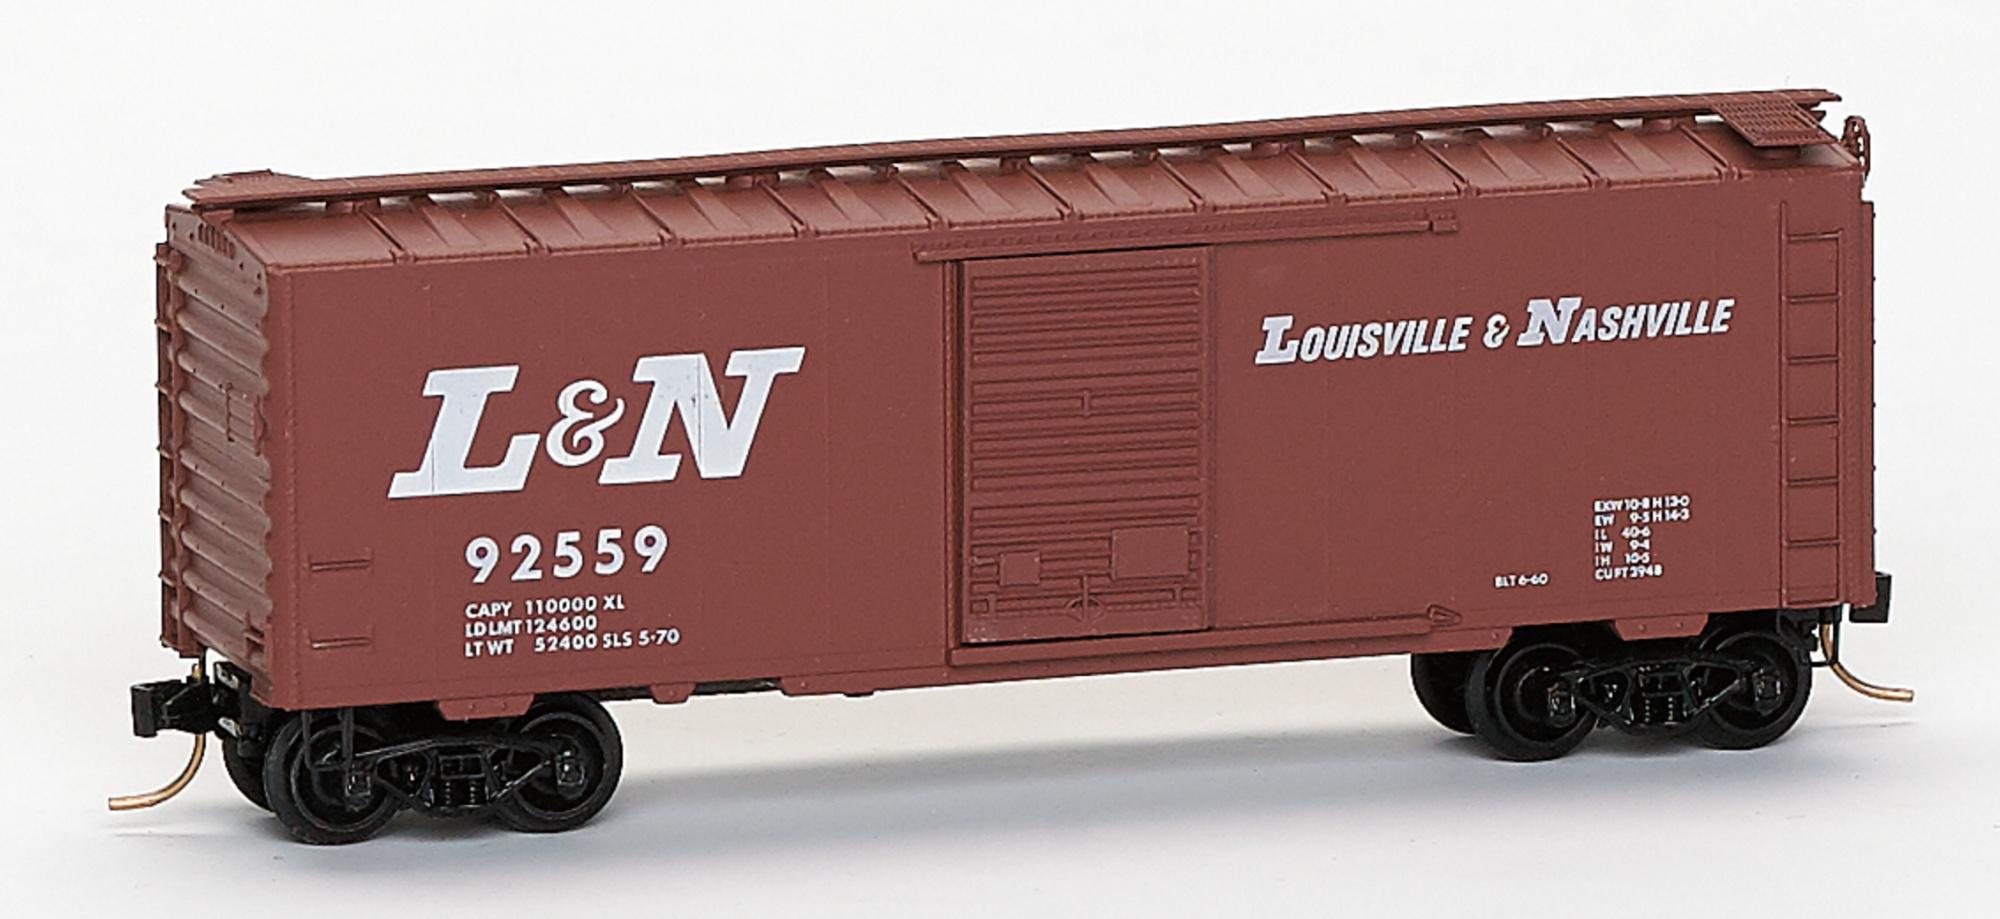 N Scale - Brooklyn Locomotive Works - BLW-35 - Boxcar, 40 Foot, PS-1 - Louisville & Nashville - 92559